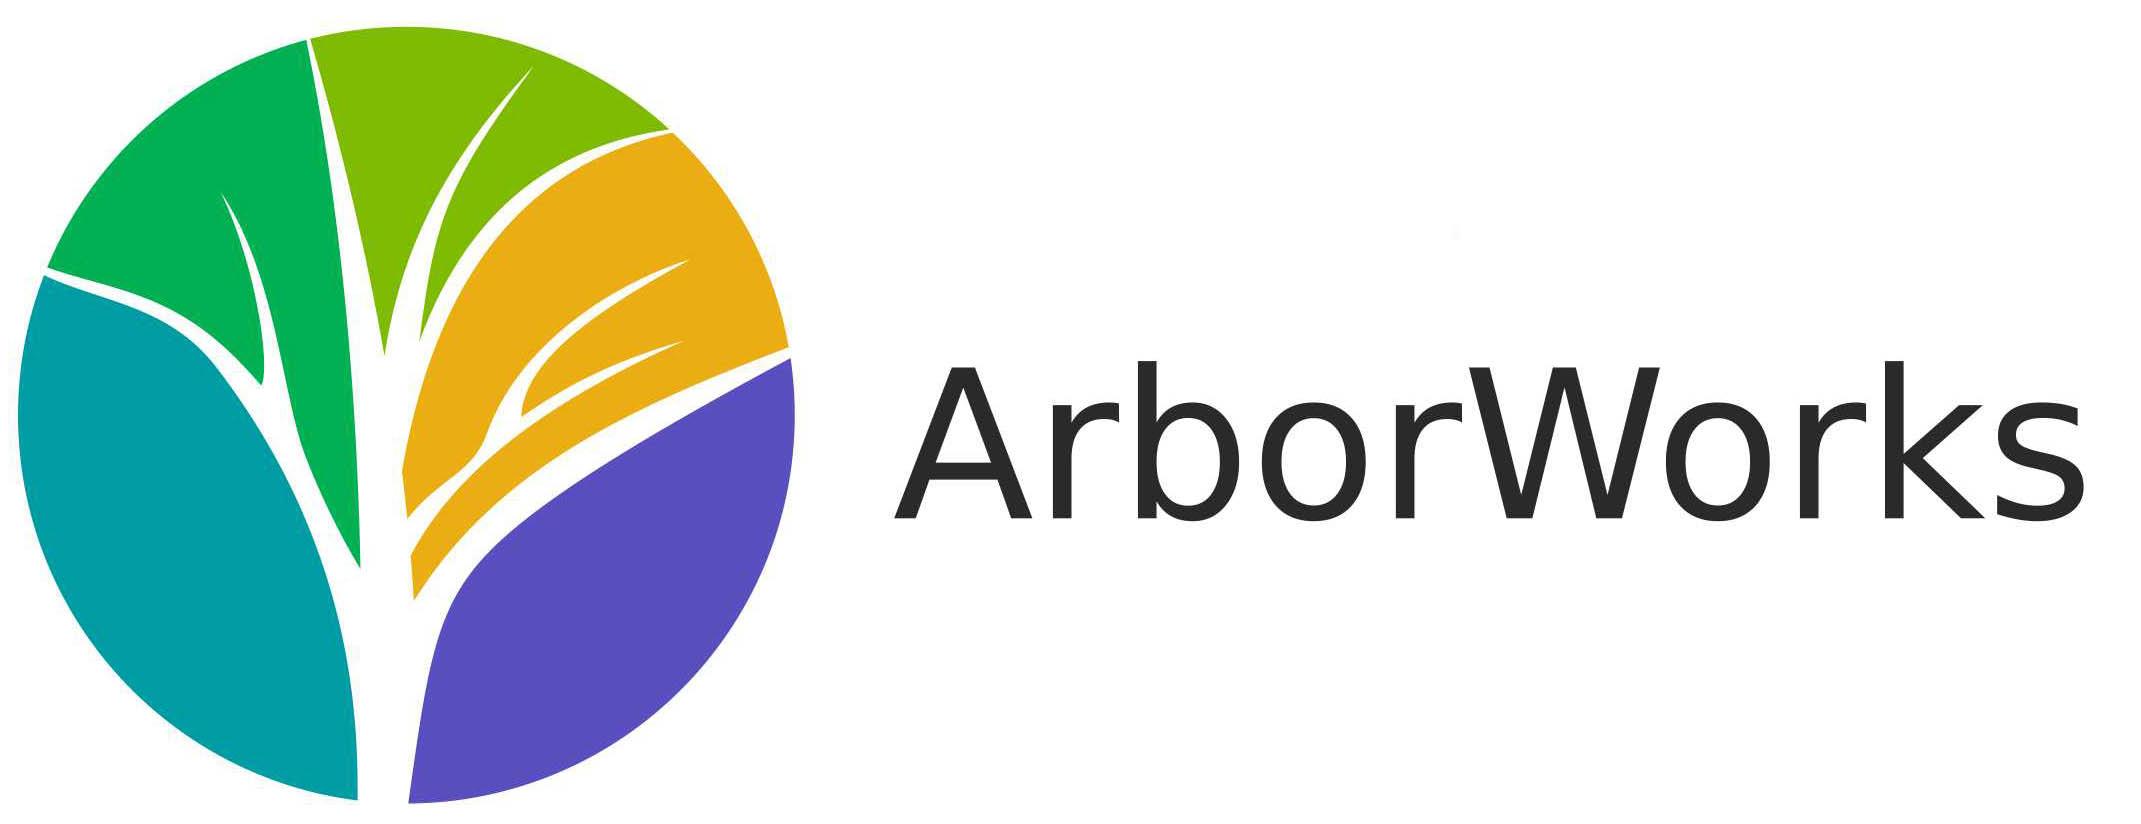 ArborWorks